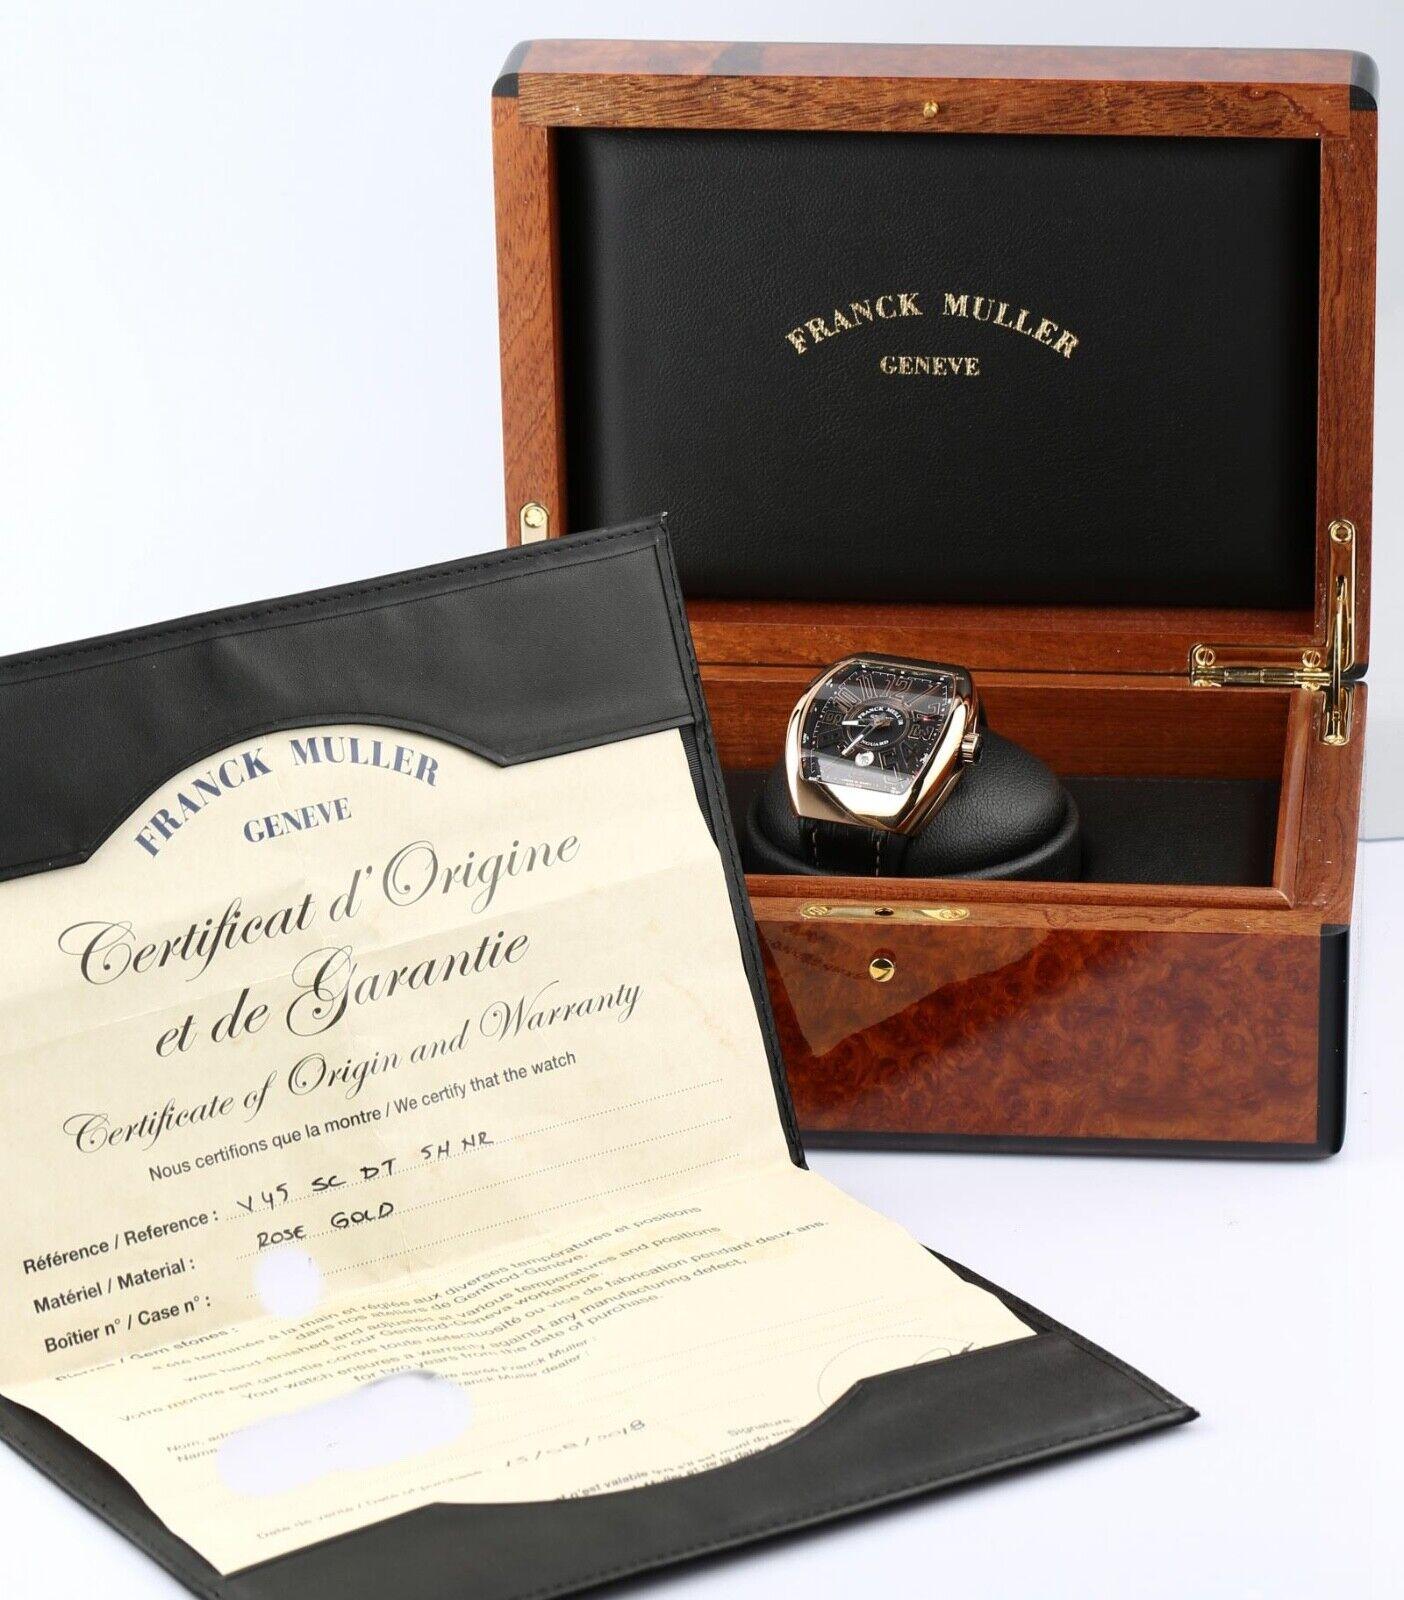 Franck Muller Vanguard Ref# V 45 SC DT 18k Rose Gold Automatic Wristwatch - watch picture 1